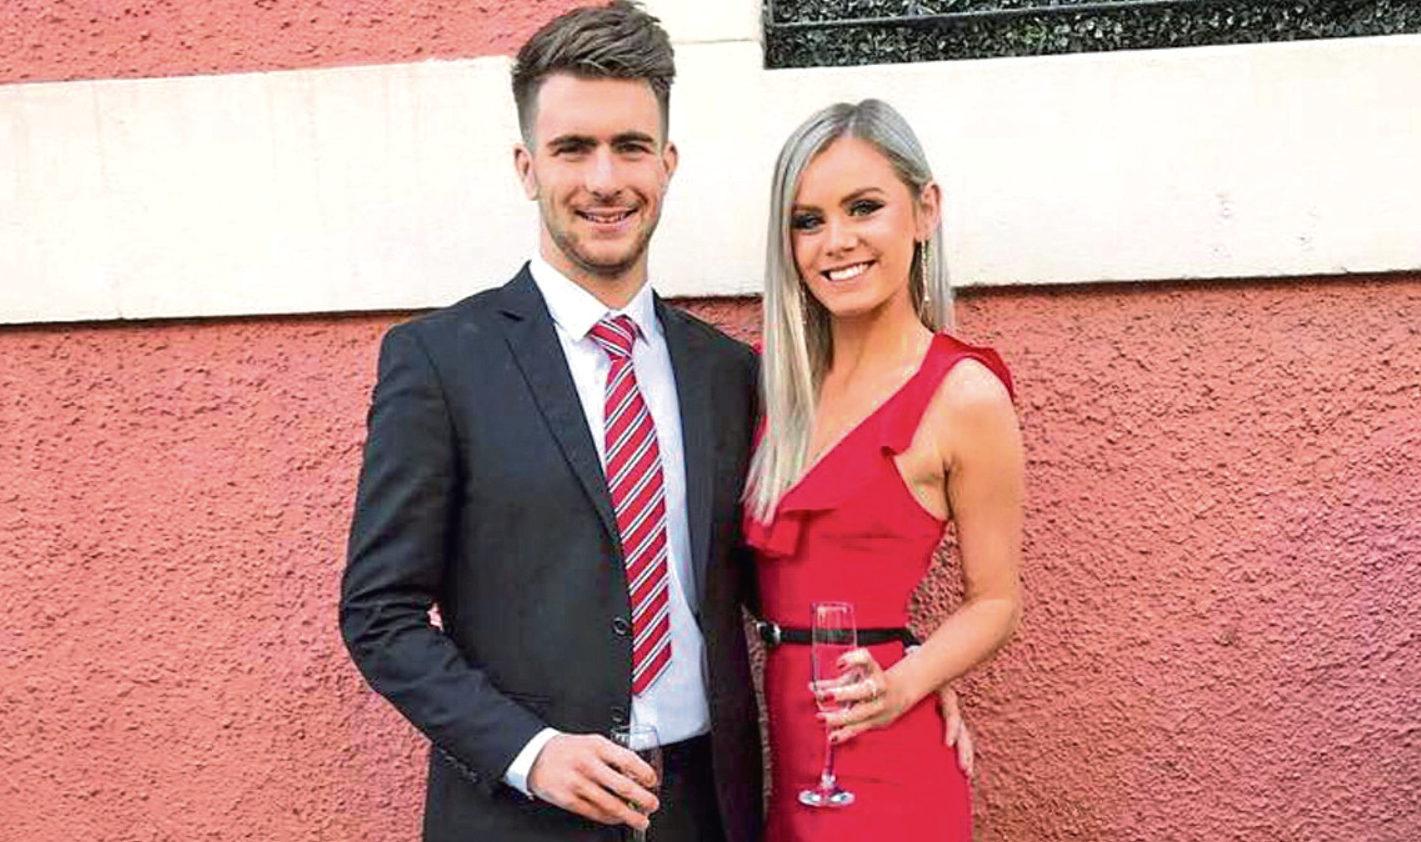 Scott Calder and girlfriend Madison Watson